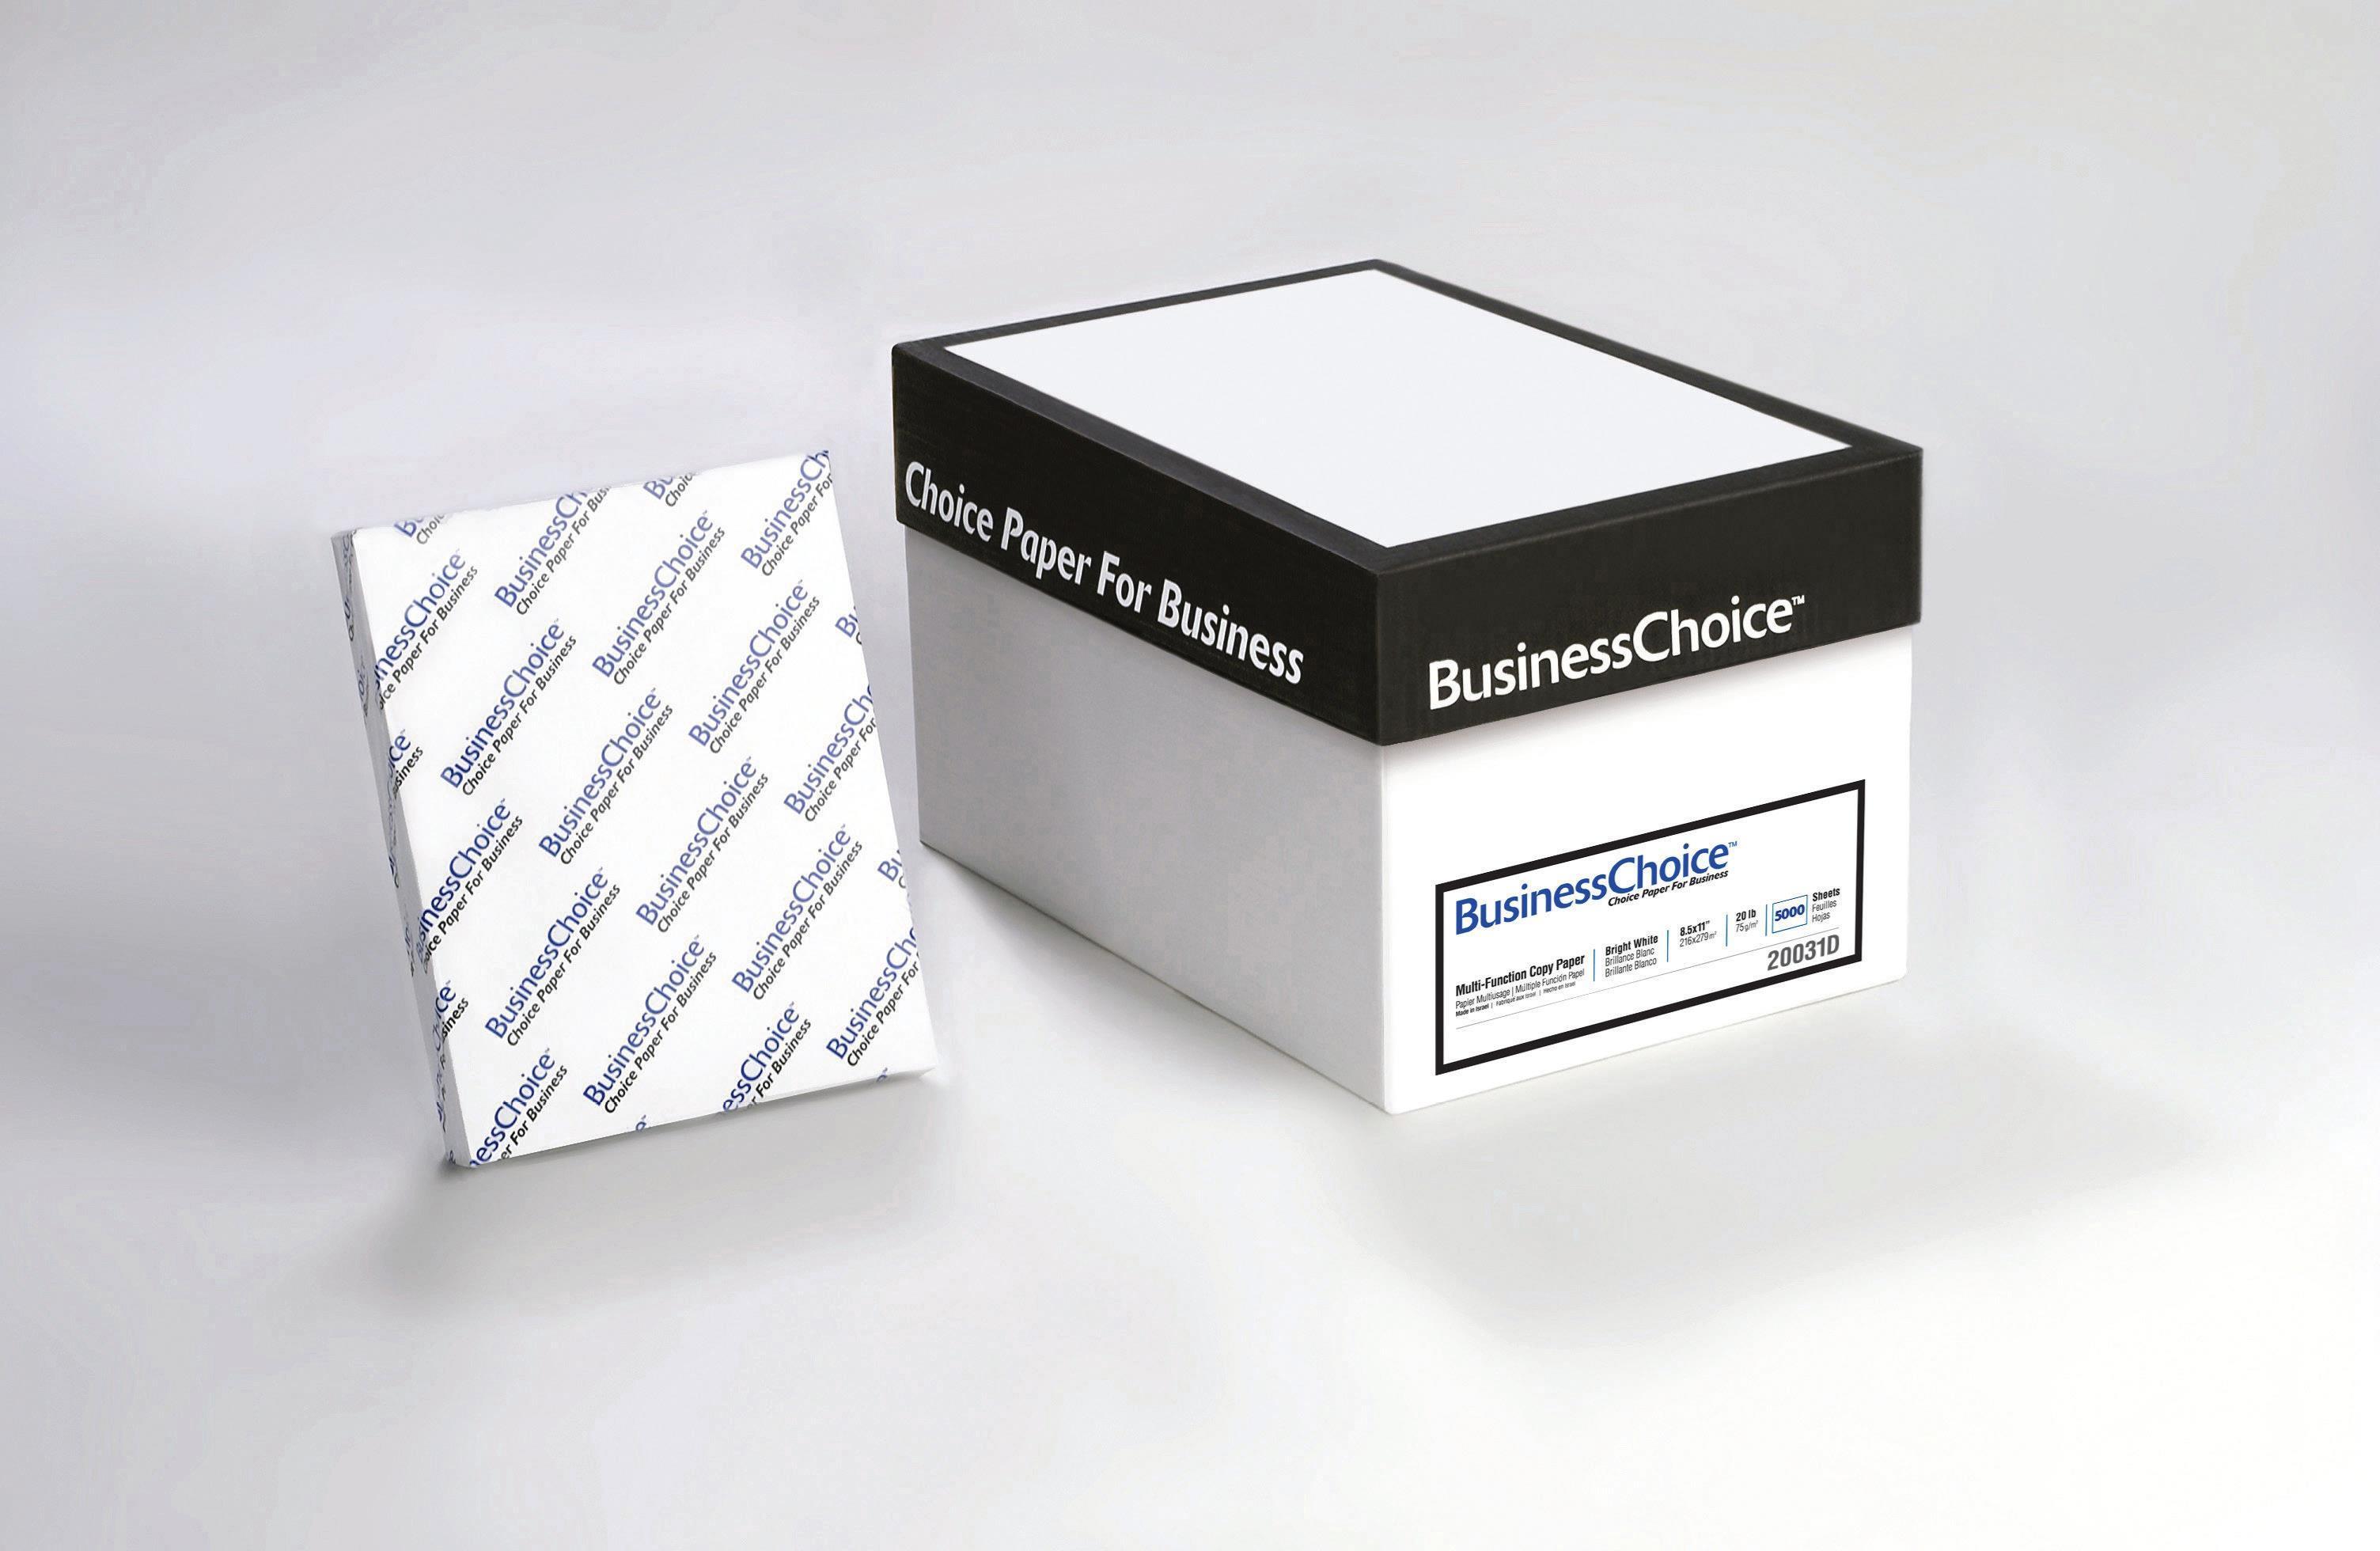 white A3 Office Paper Paper Scrap, Occ, Onp, Oinp, A3 / A4 Waste Office Paper